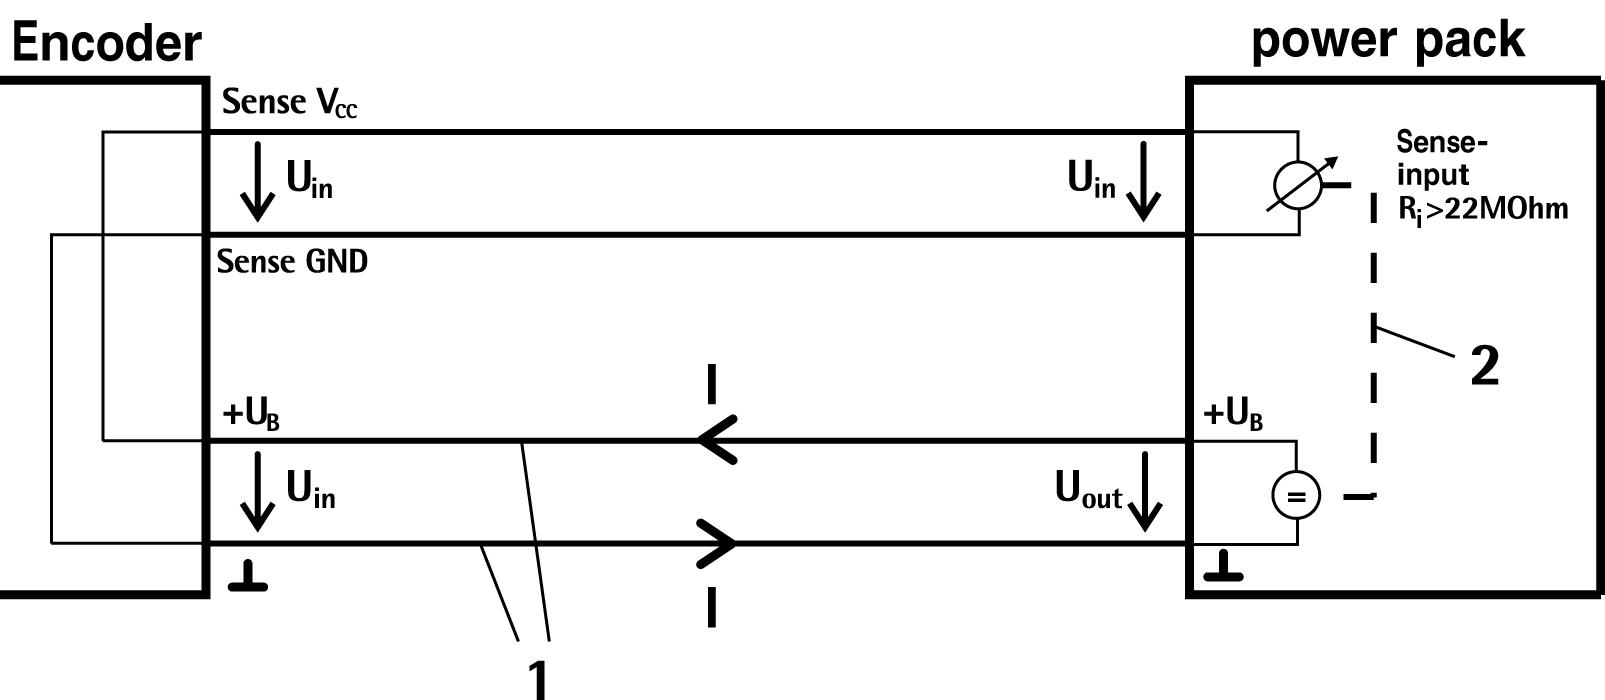 Voltage monitoring Sense with 5V encoder - Hengstler GmbHHengstler GmbH